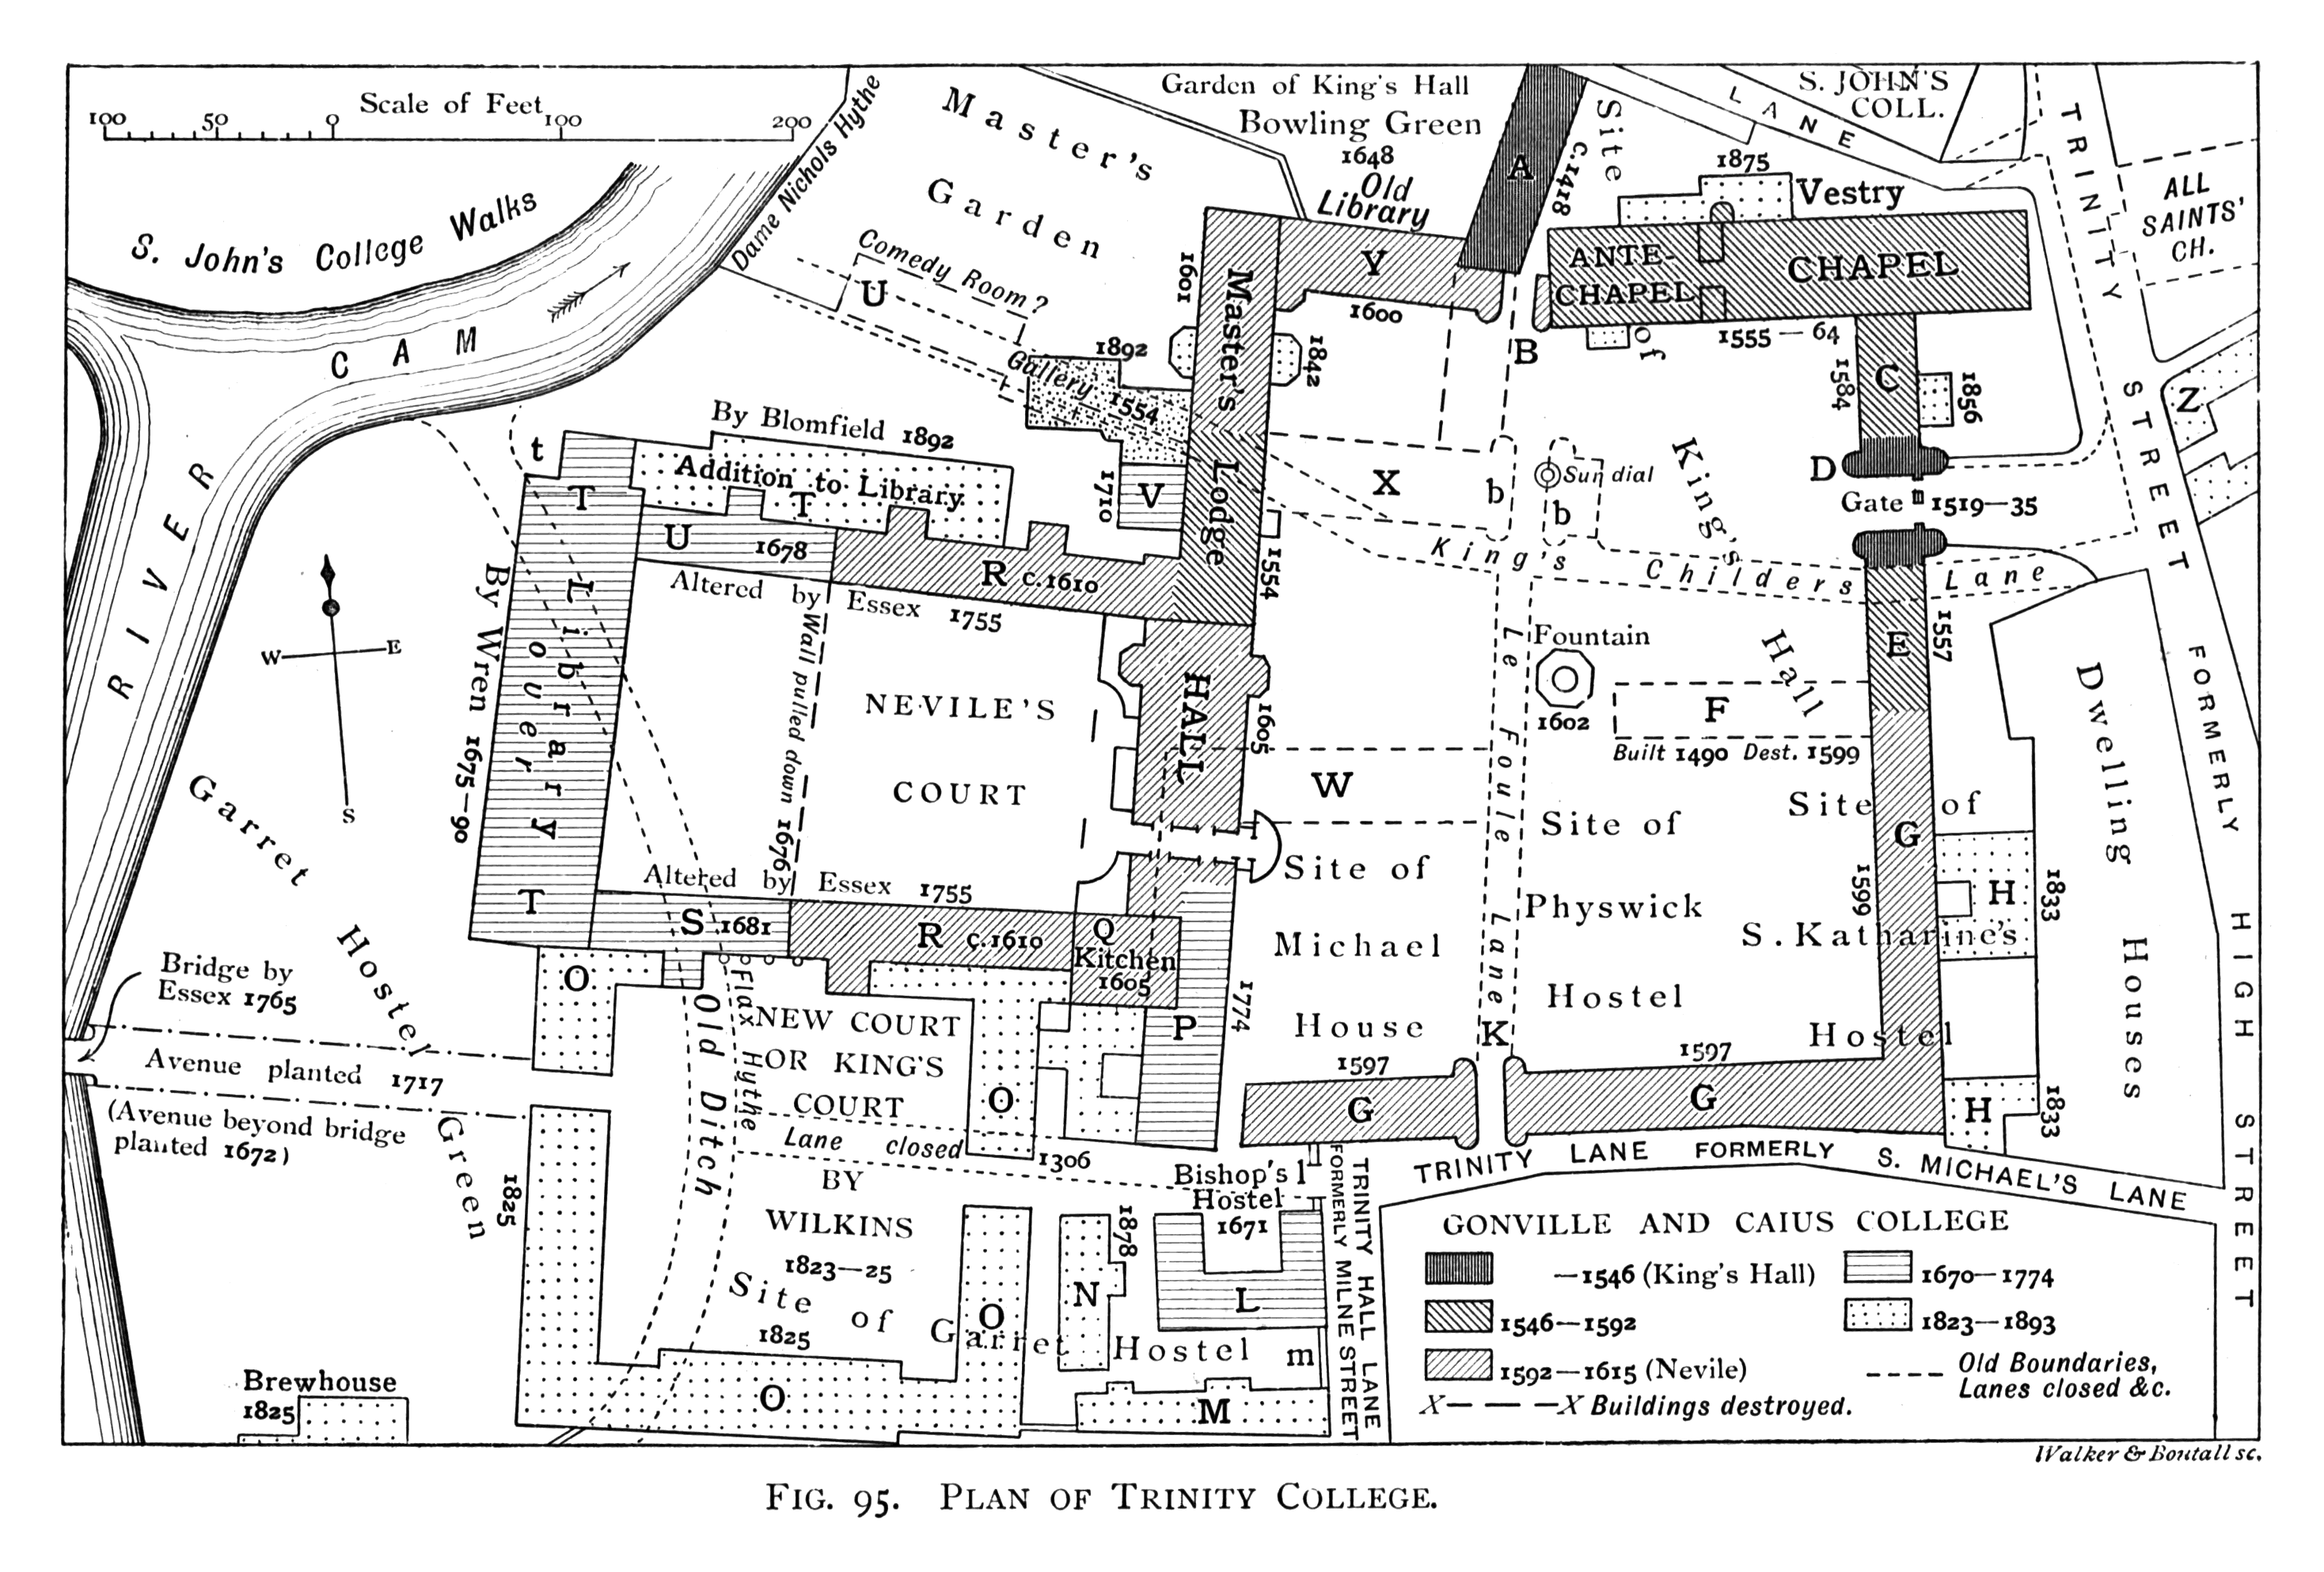 Historical Plan Of Trinity College Cambridge 1897 The